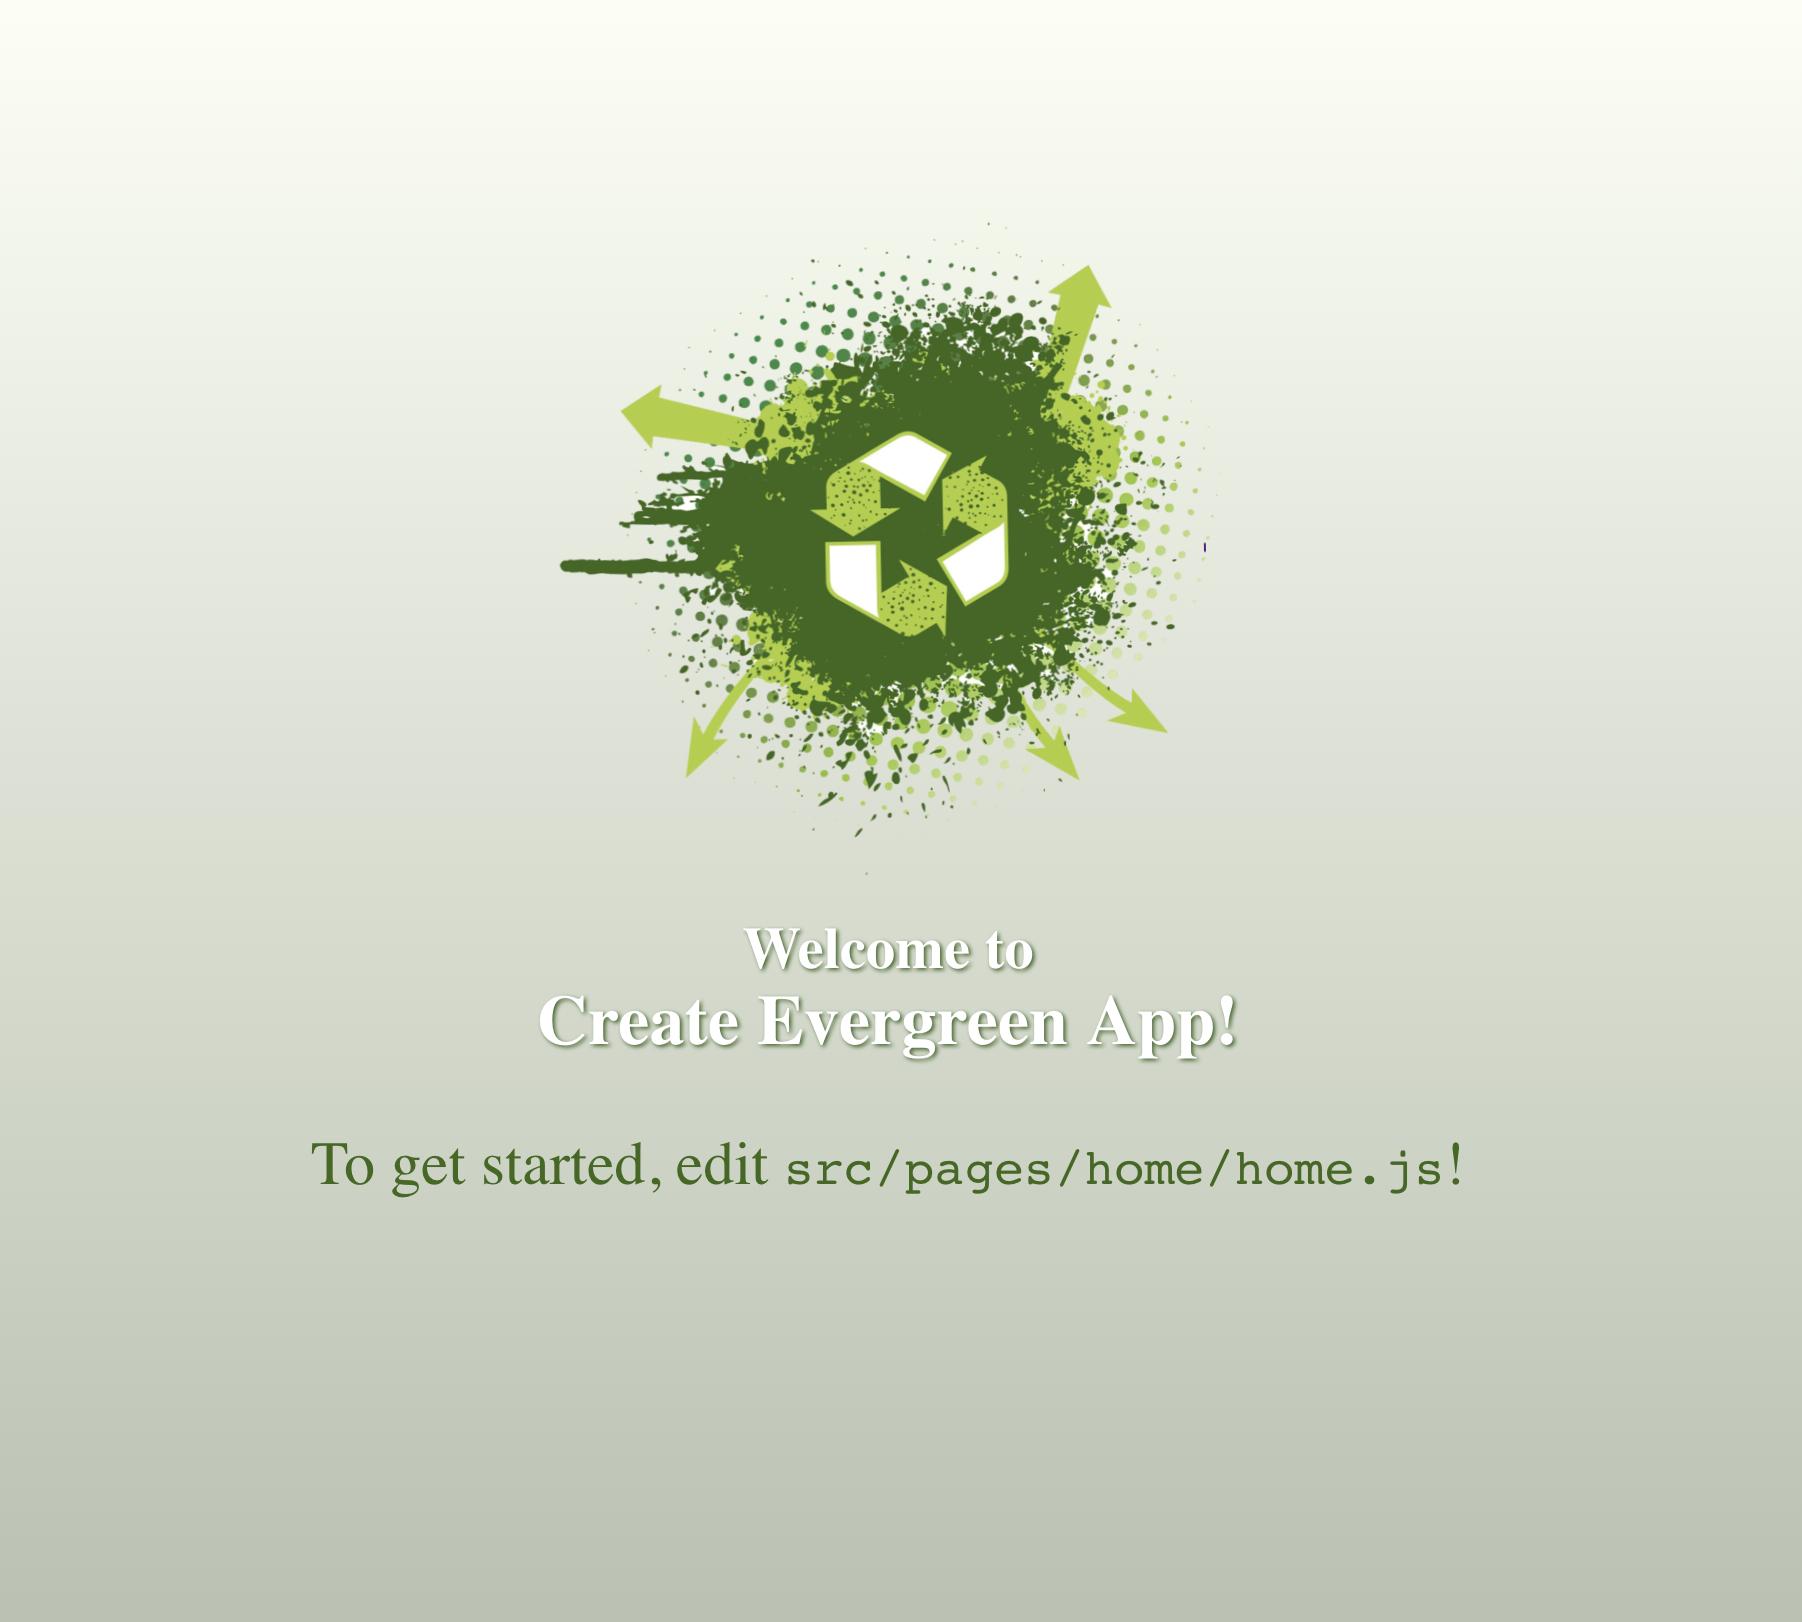 Create Evergreen App